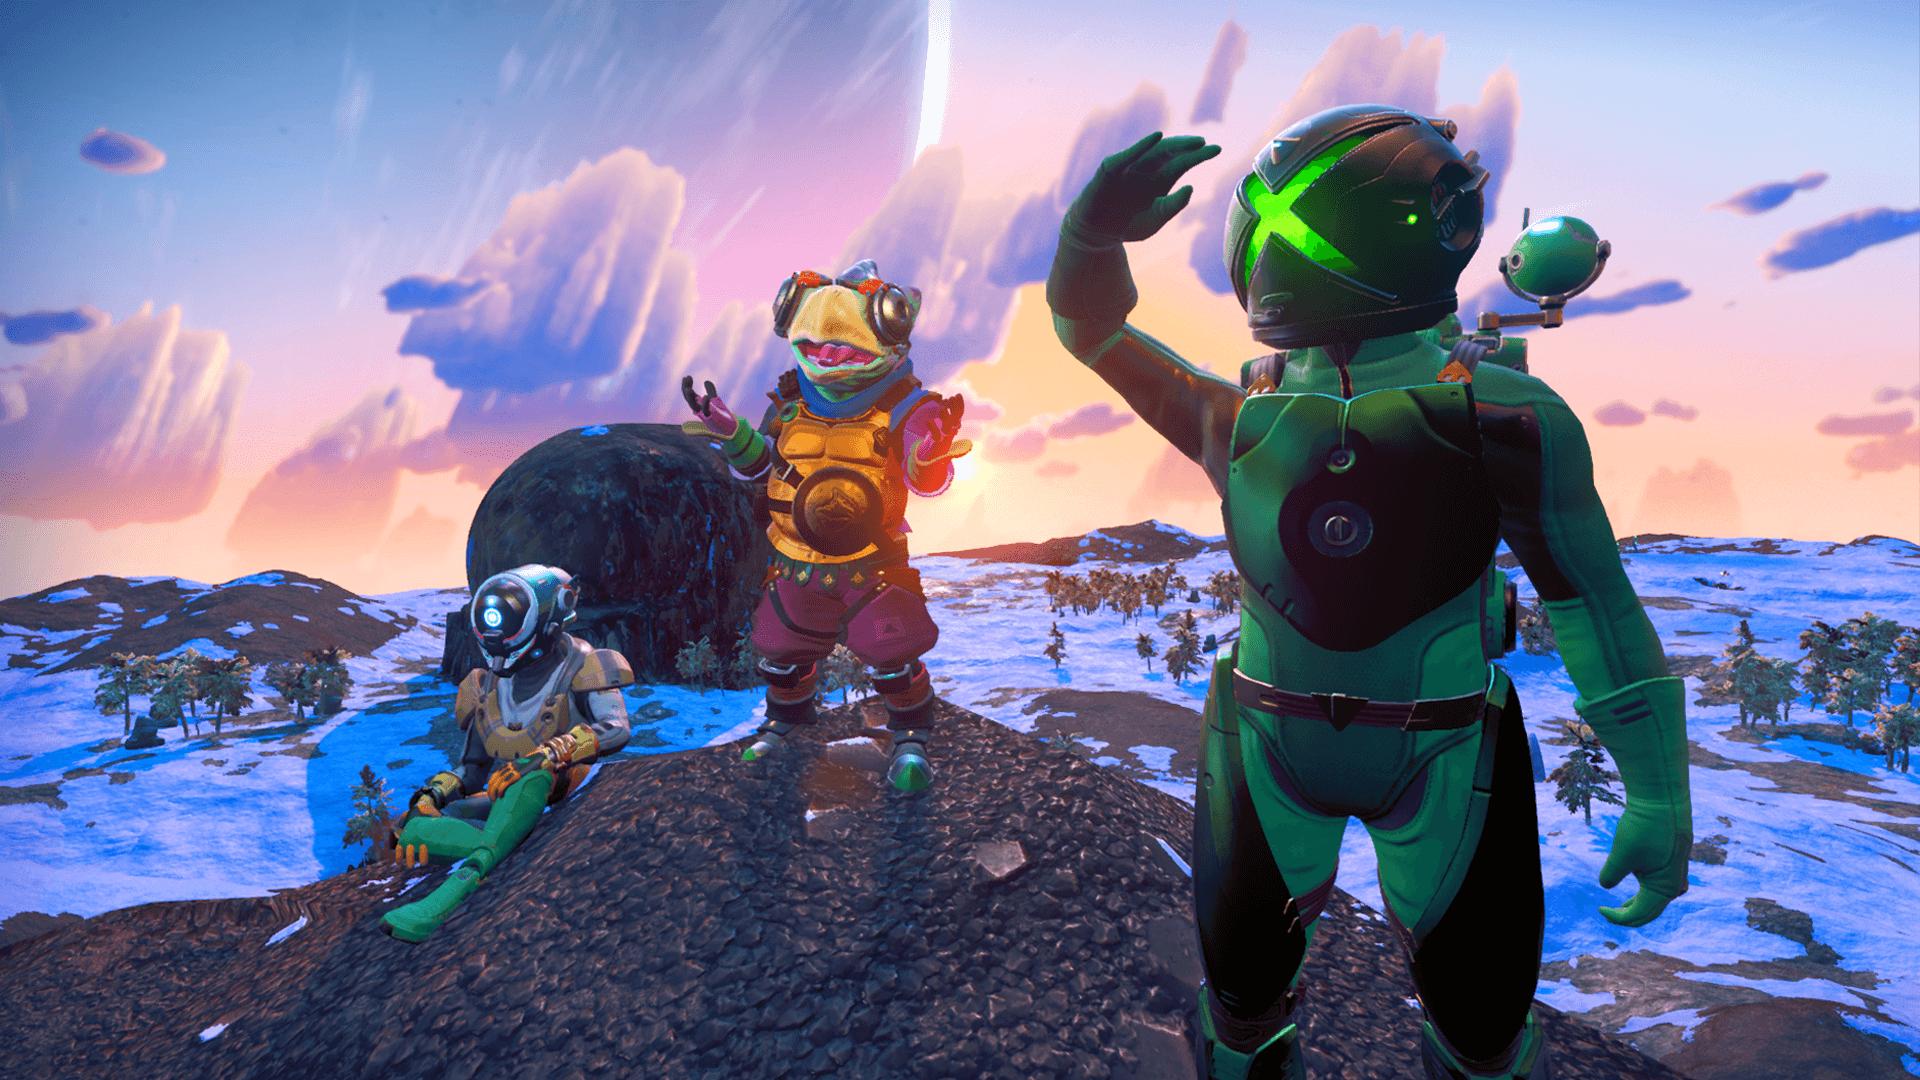 Image for No Man's Sky cross-platform multiplayer support coming June 11